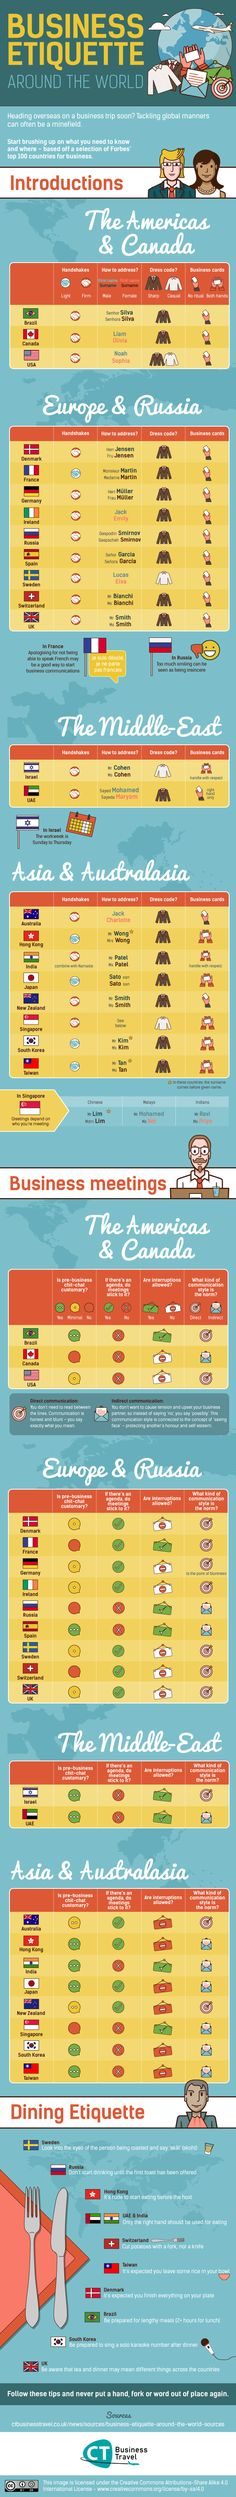 """Business Etiquette around the World"""